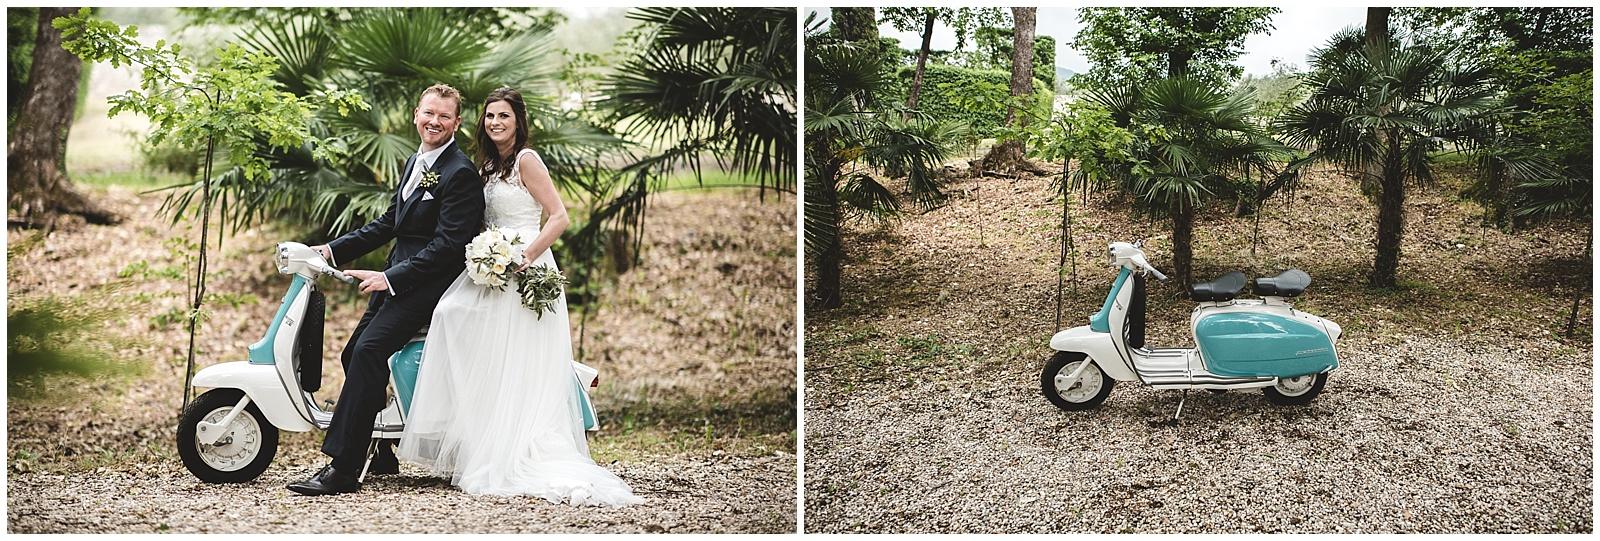 wedding in italy foorevent_0044